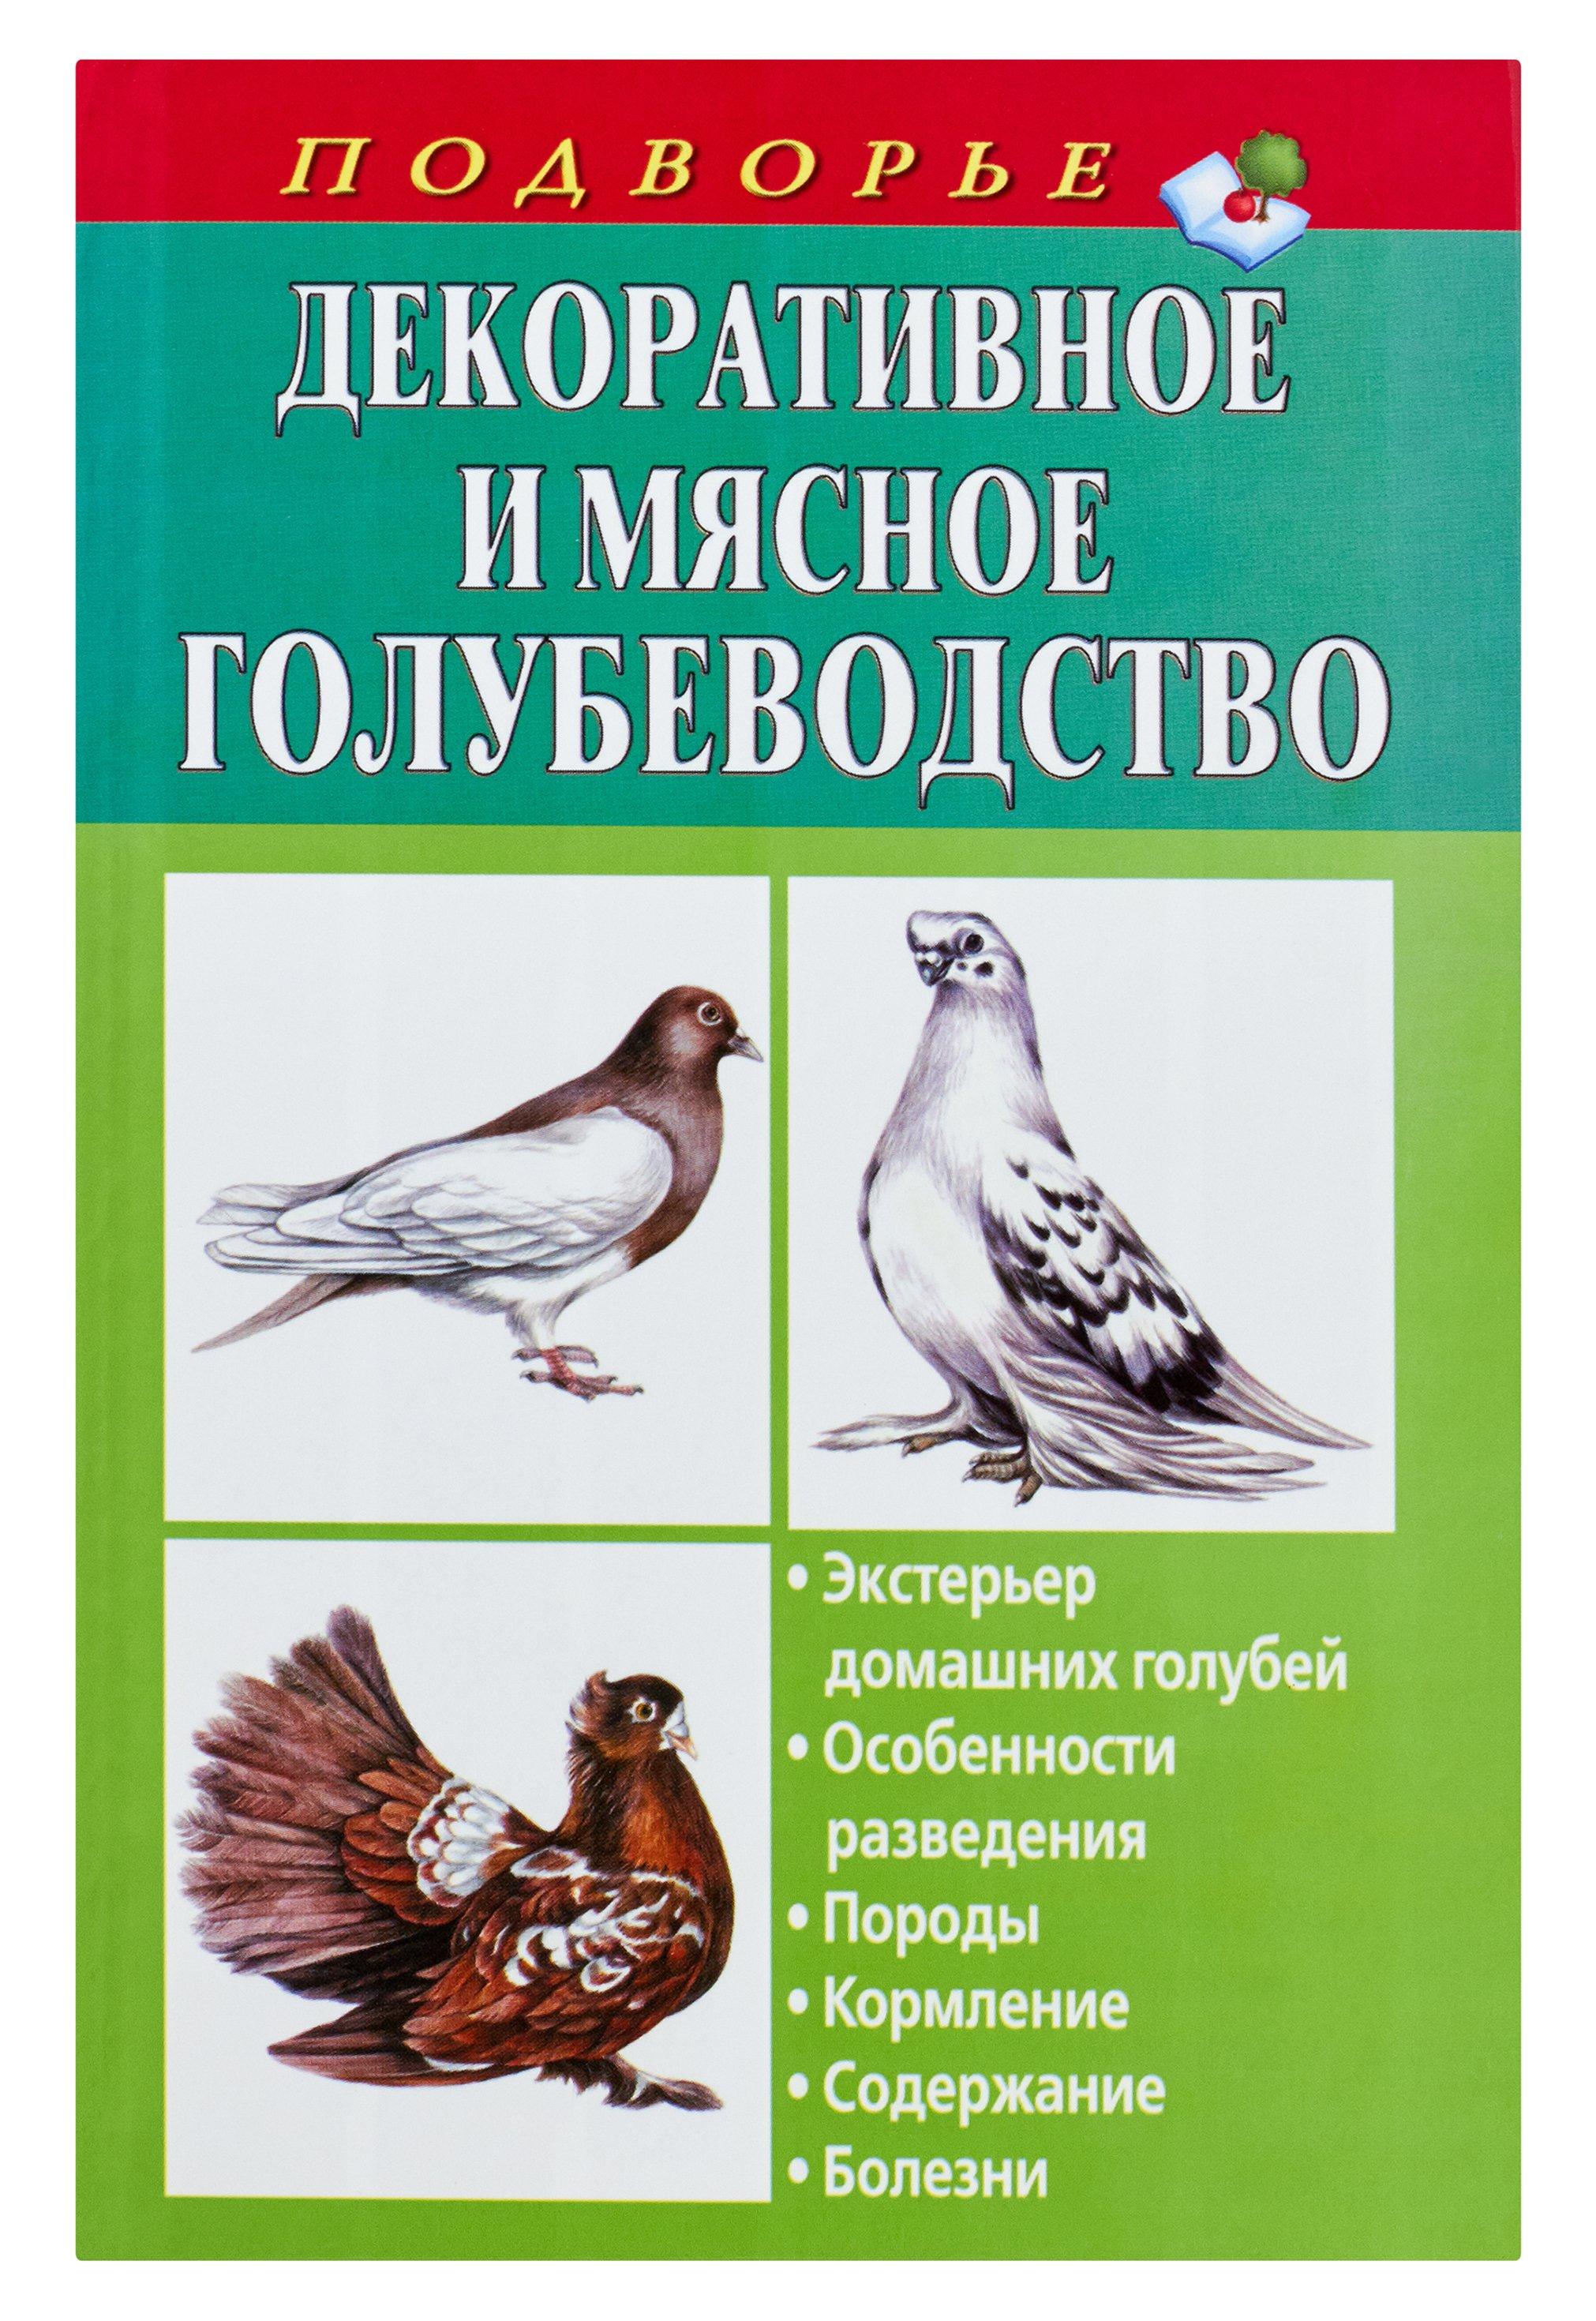 Новая книга /ndc/iblock/519/519bdaa629d92ca07999b6866e6a63e4/53290dc689abd2a3aca9a54c847a68dd.jpg на deti-best.ru